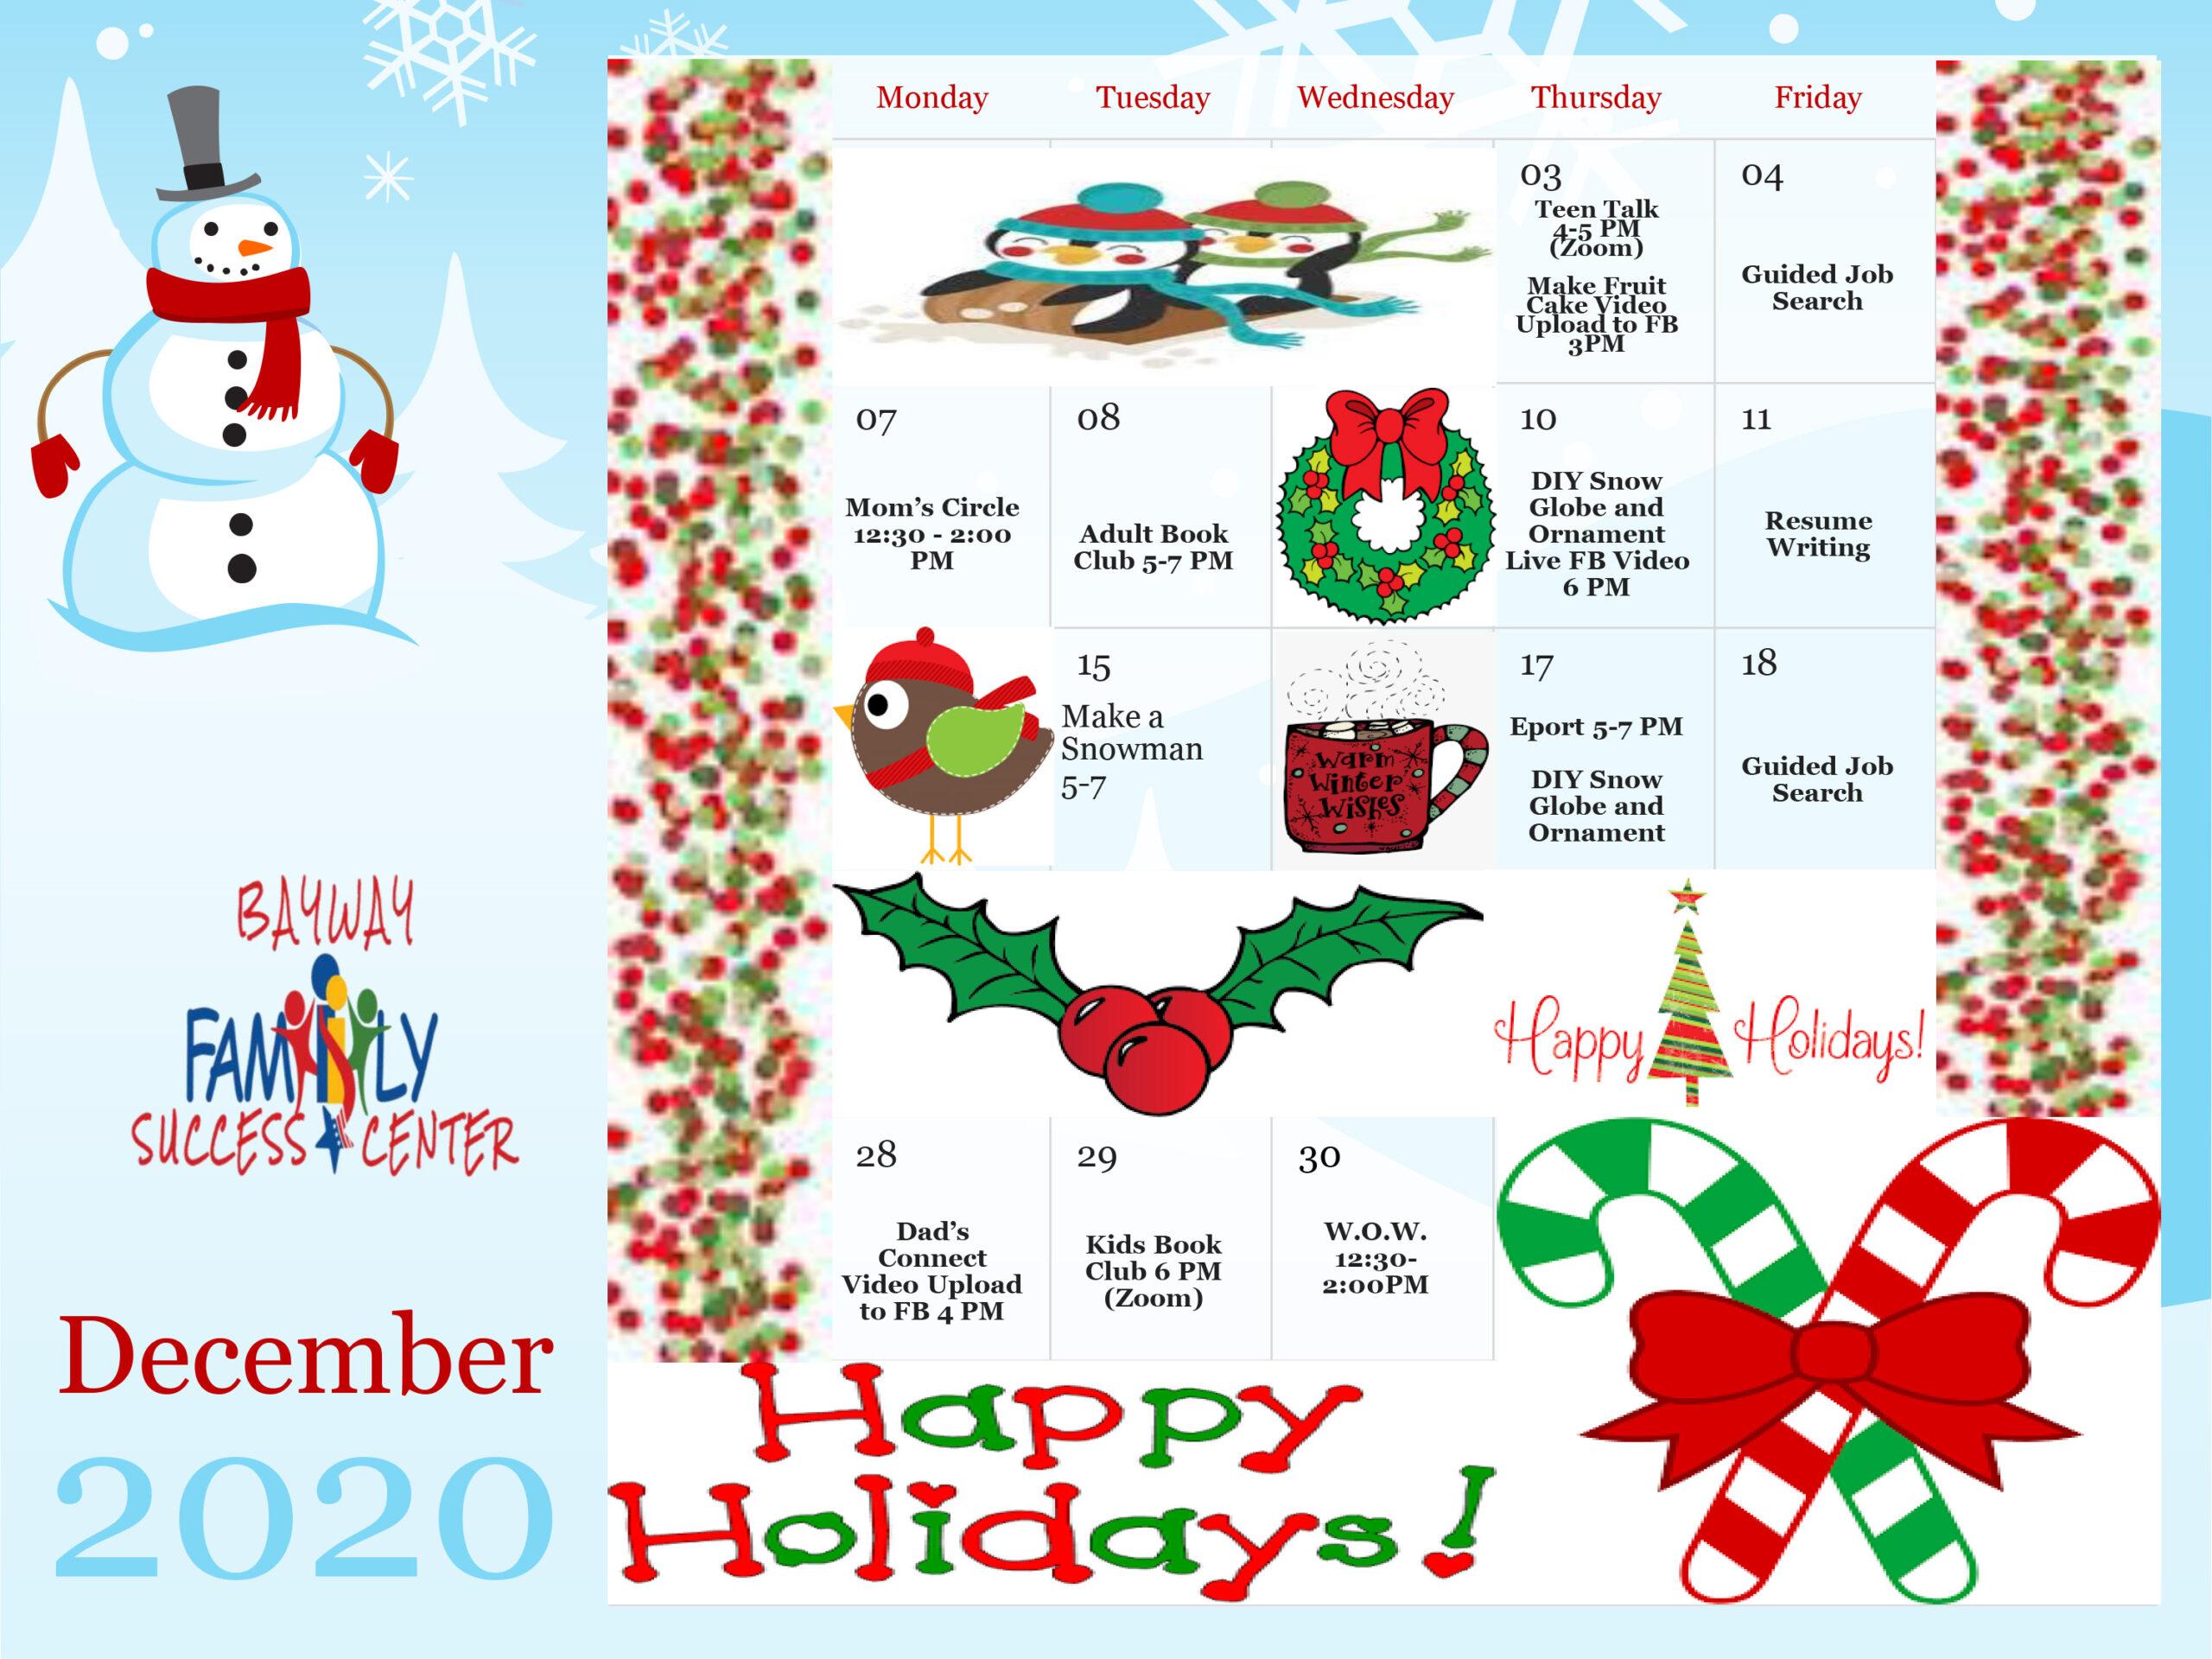 Bayway Family Success Center Calendar December 2020